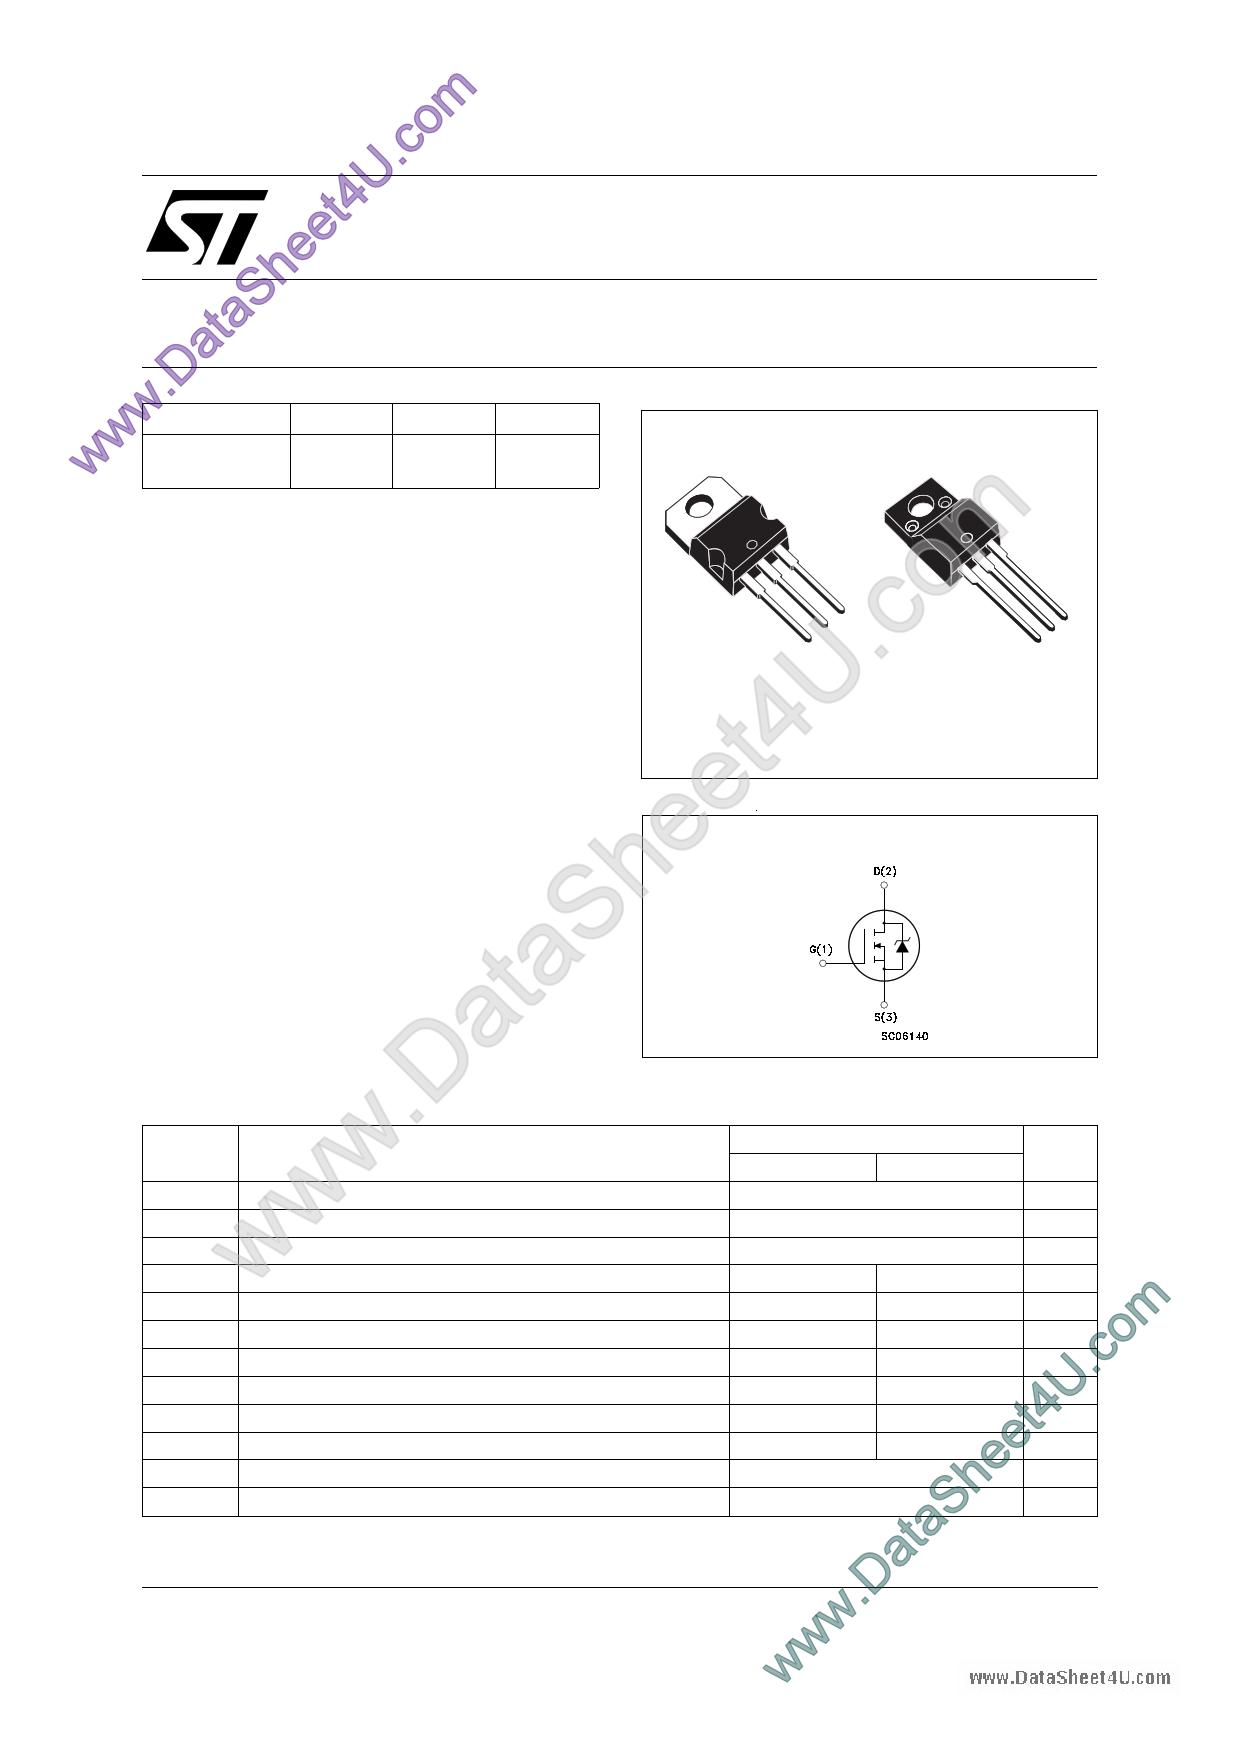 P3NB80FP Datasheet, P3NB80FP PDF,ピン配置, 機能